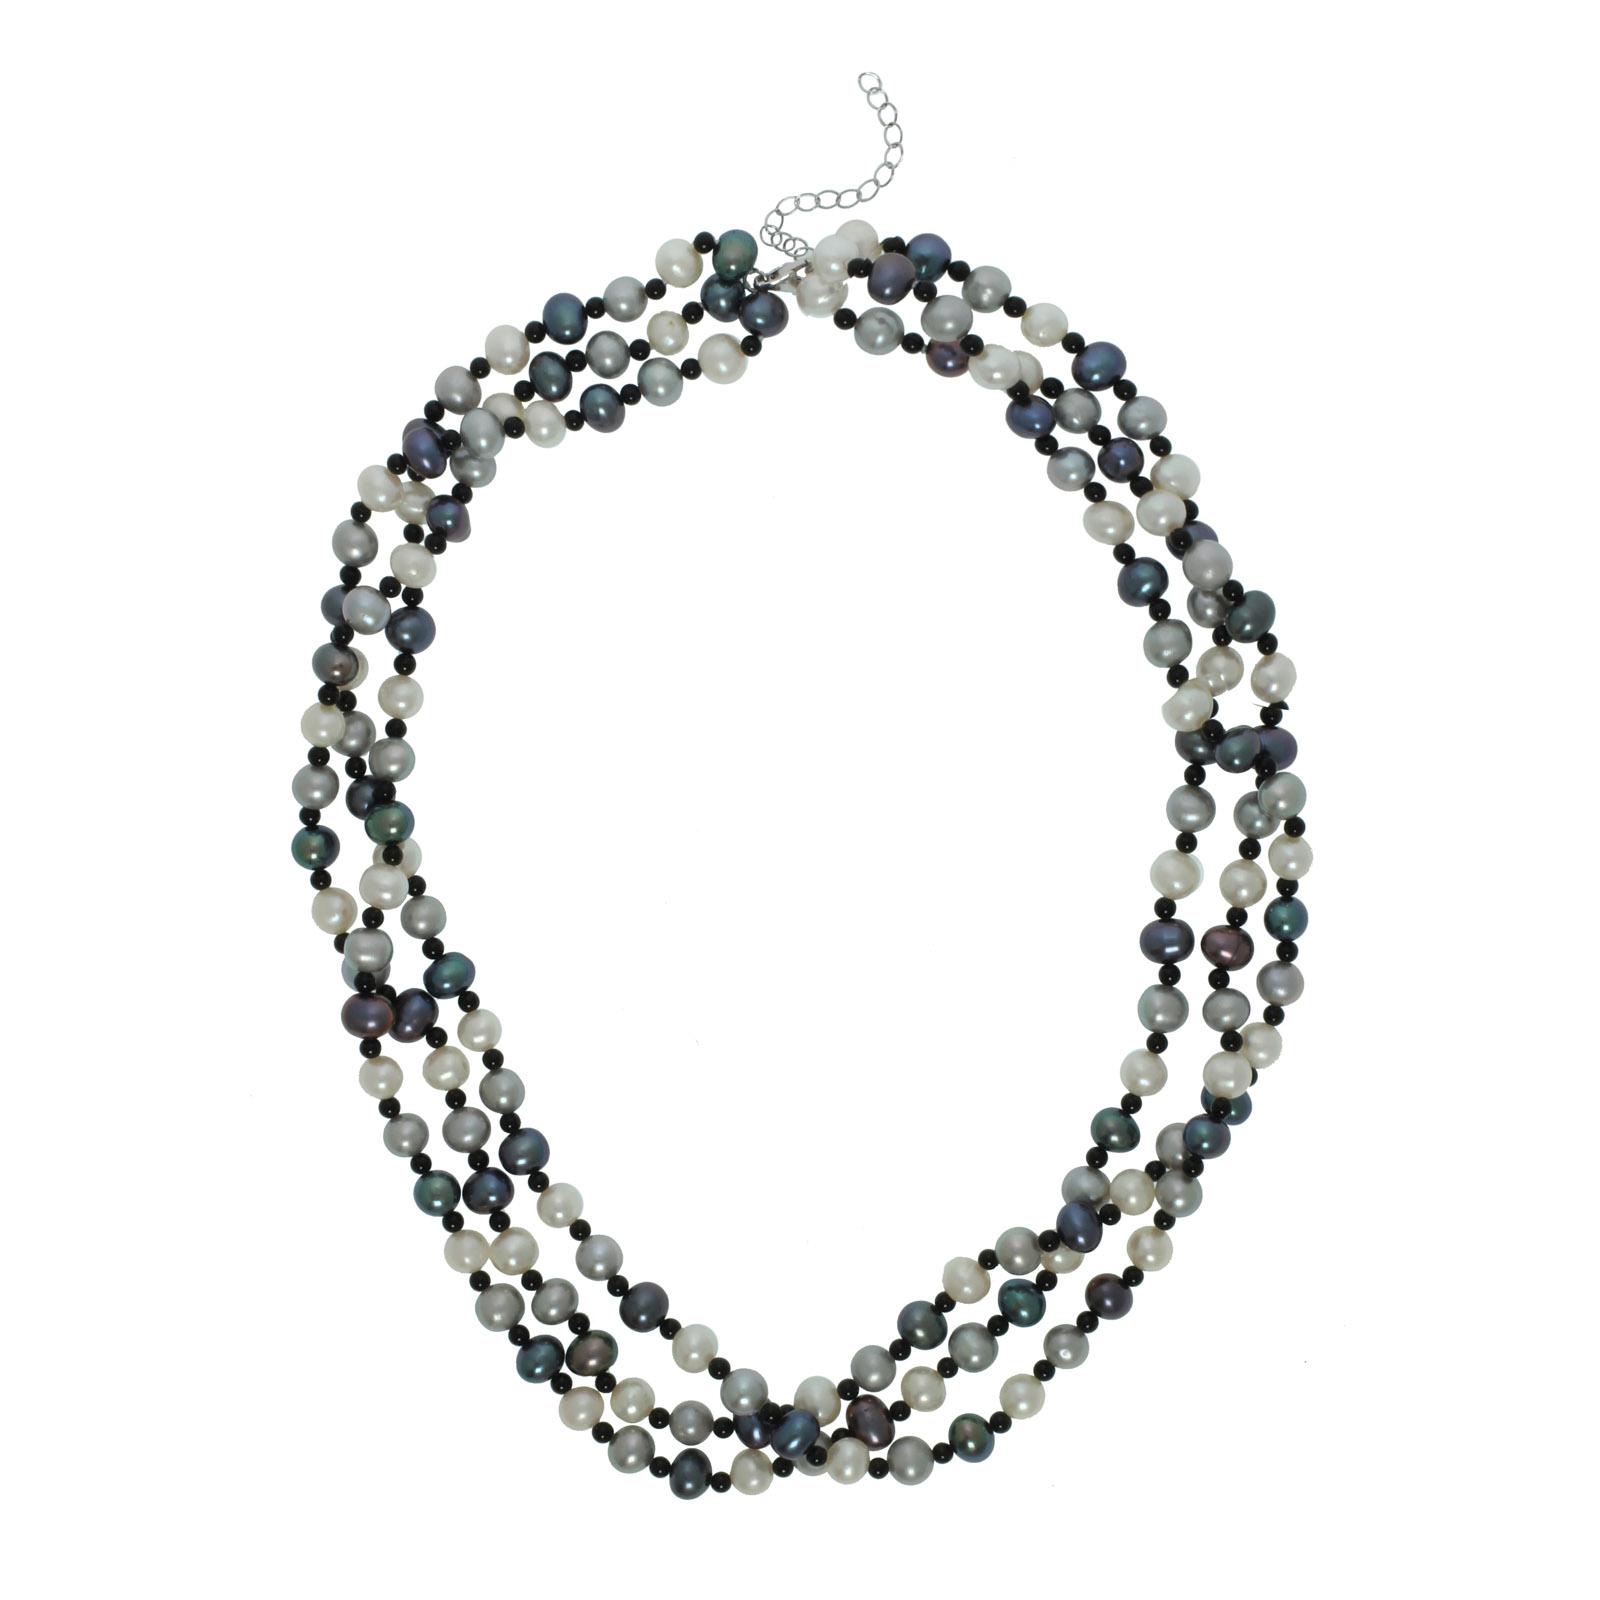 "Multi Tonal Black Freshwater Pearl  & Black Onyx Three Row Pearl Sterling Silver 18"" Necklace PartNumber: 00473535000P KsnValue: 9191436 MfgPartNumber: LT11098"